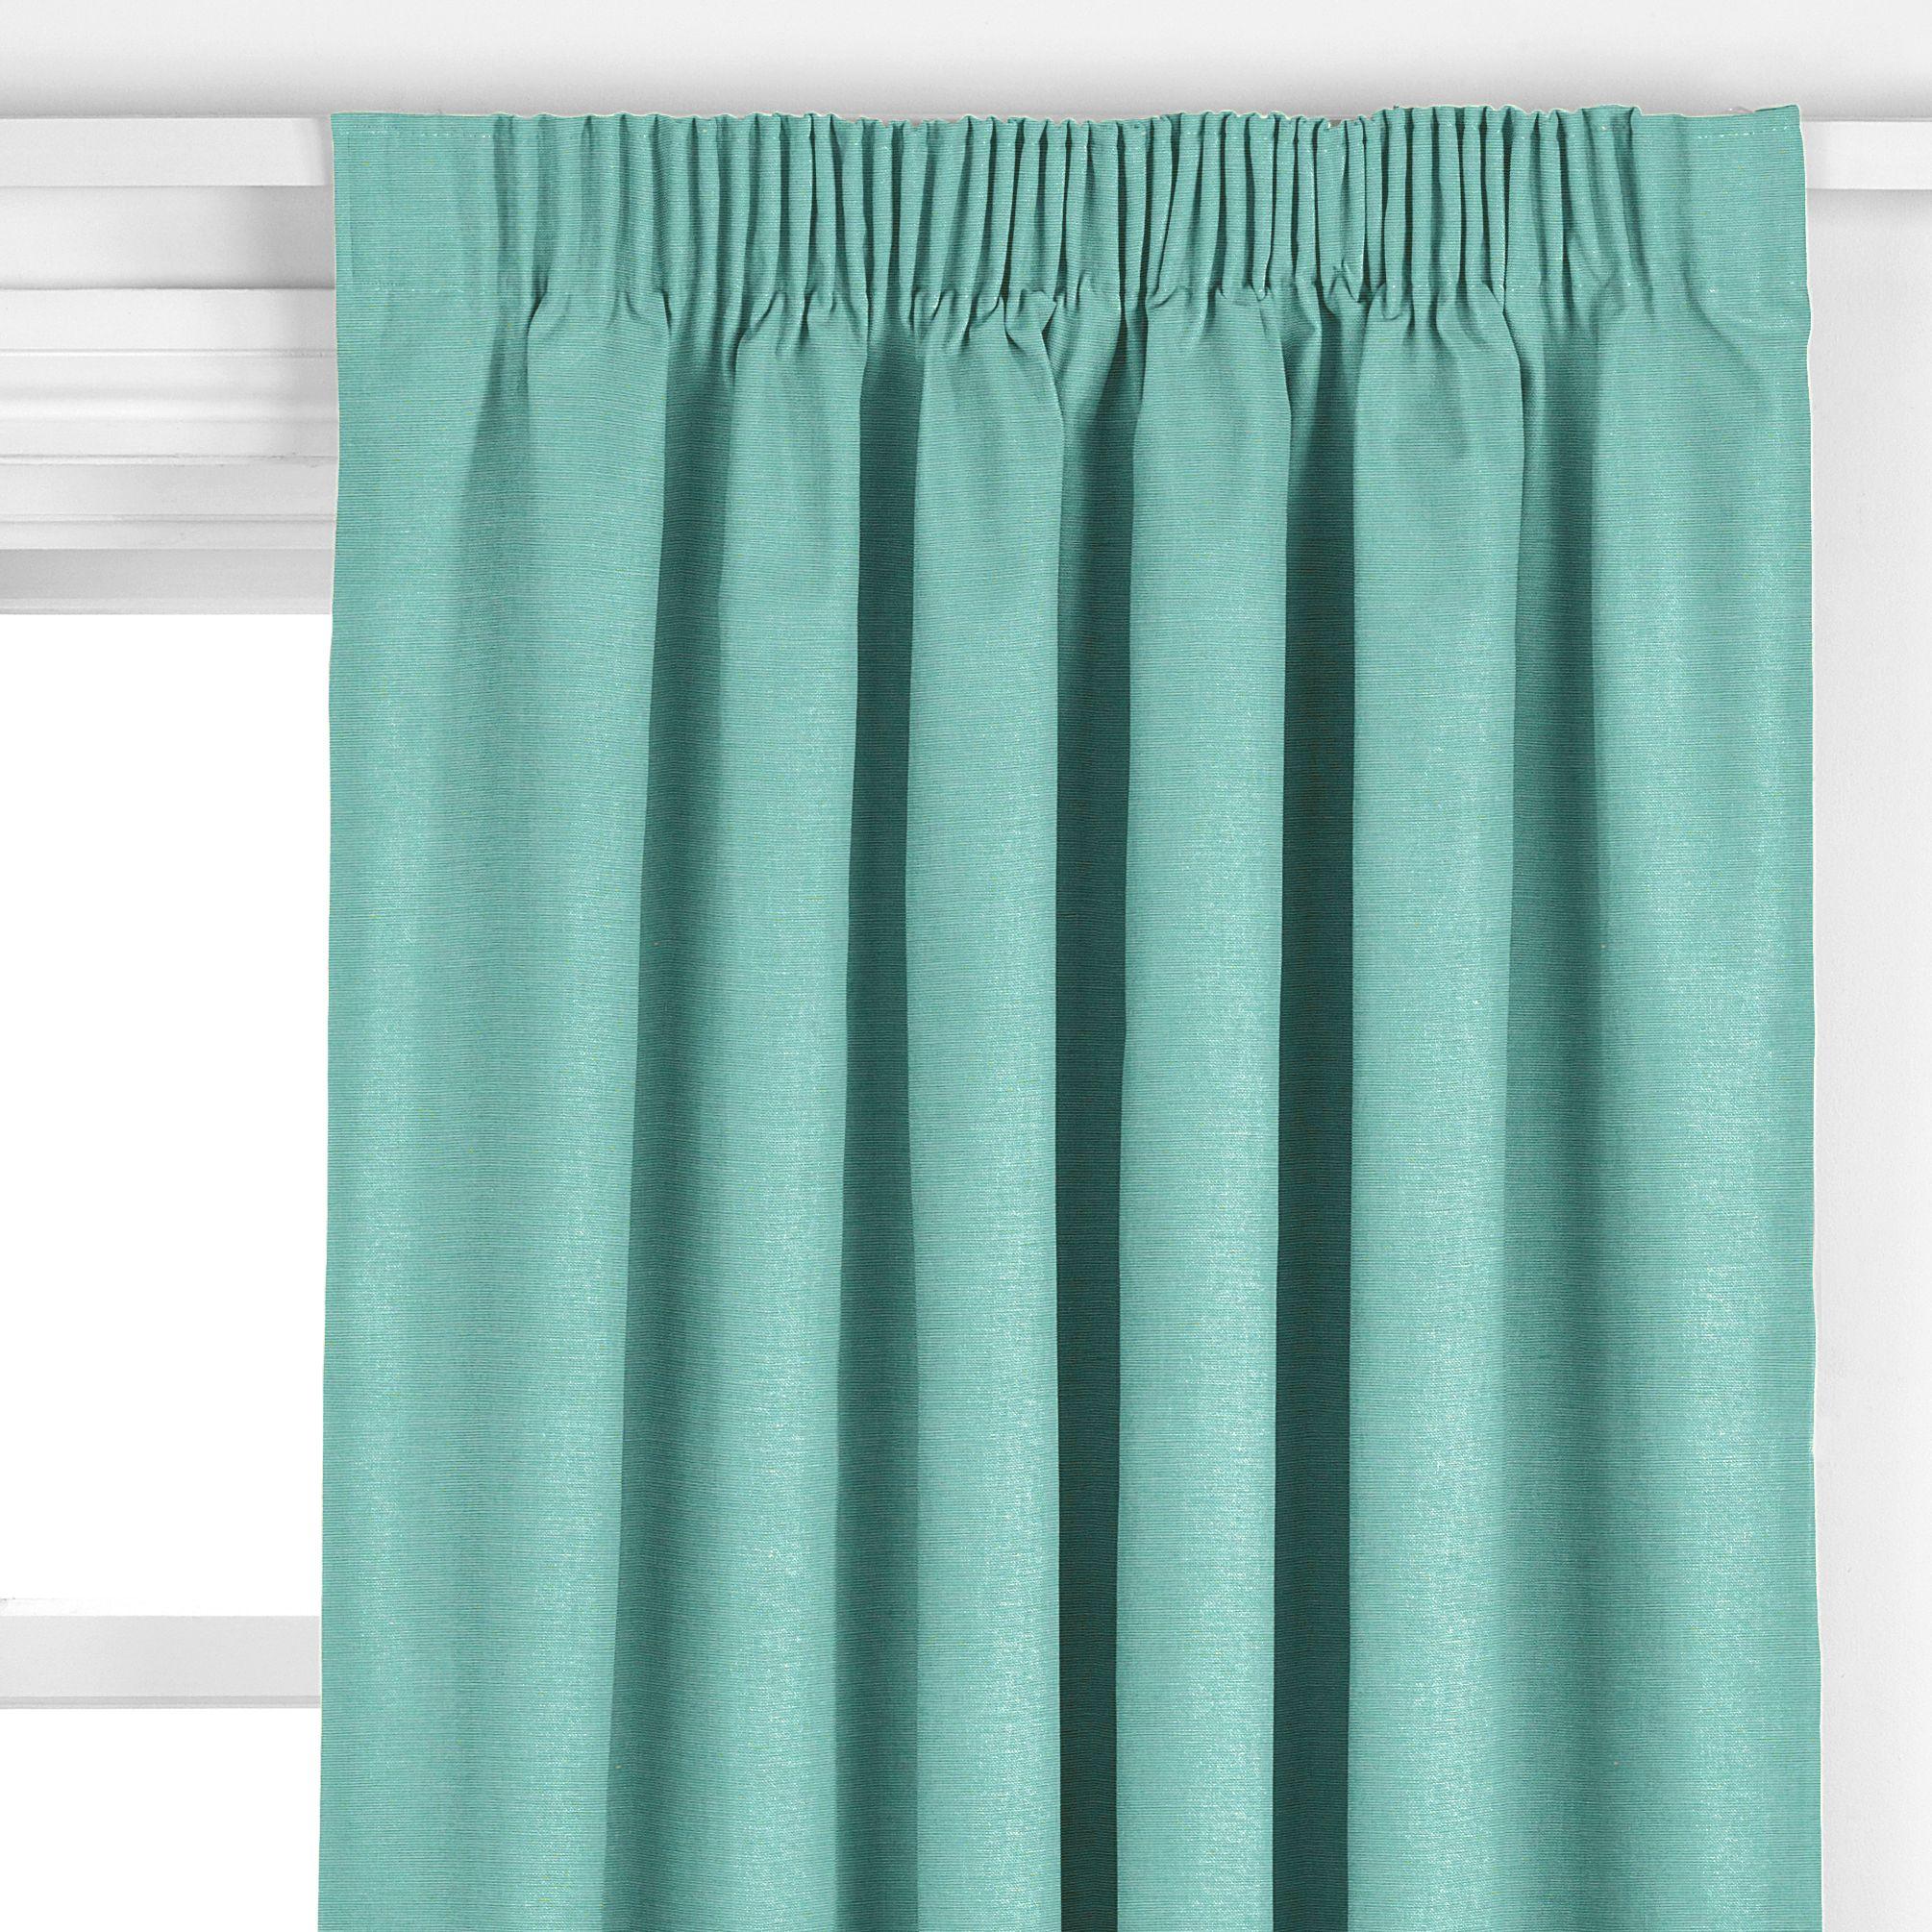 John lewis metro pencil pleat curtains pale review for Pencil pleat curtains on track